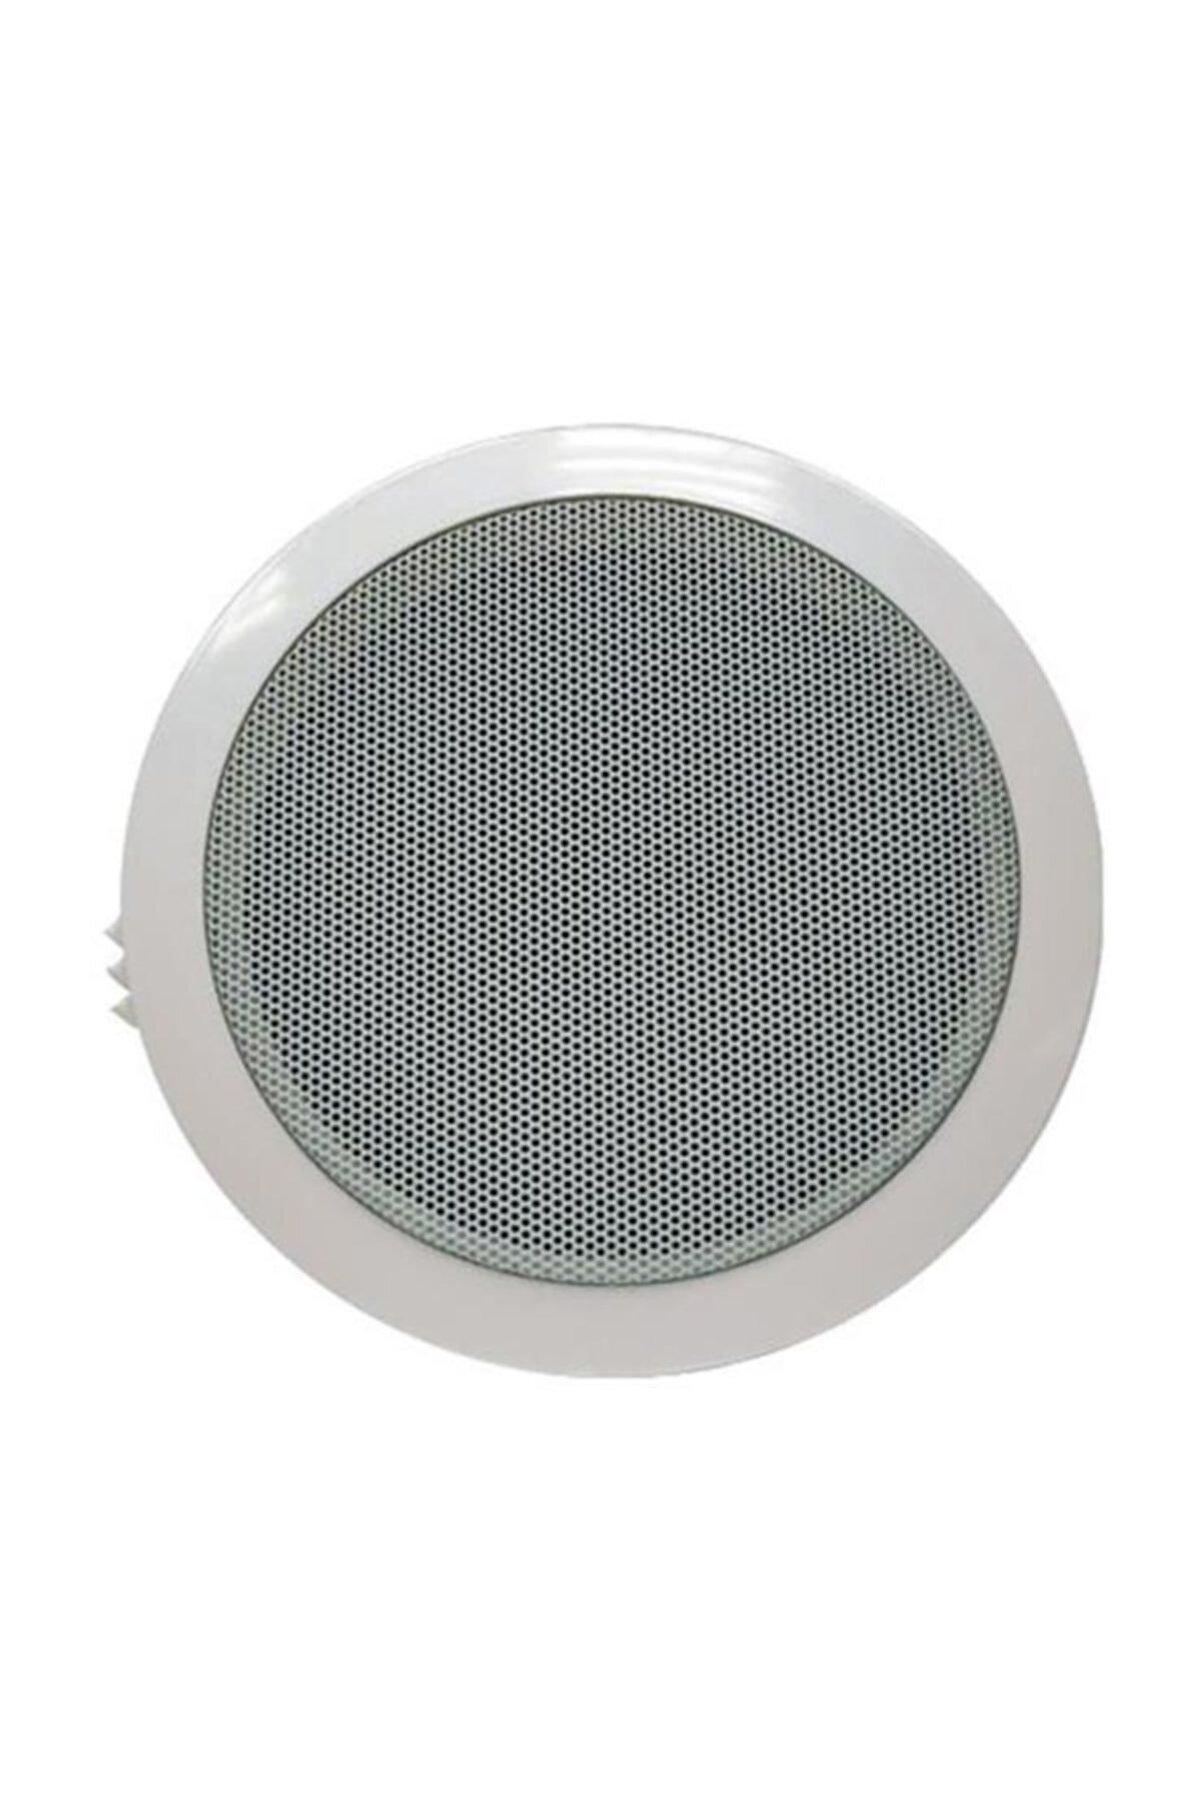 Westa Ws-1308 T 100v Asma Tavan Hoparlörü Trafolu 16 cm